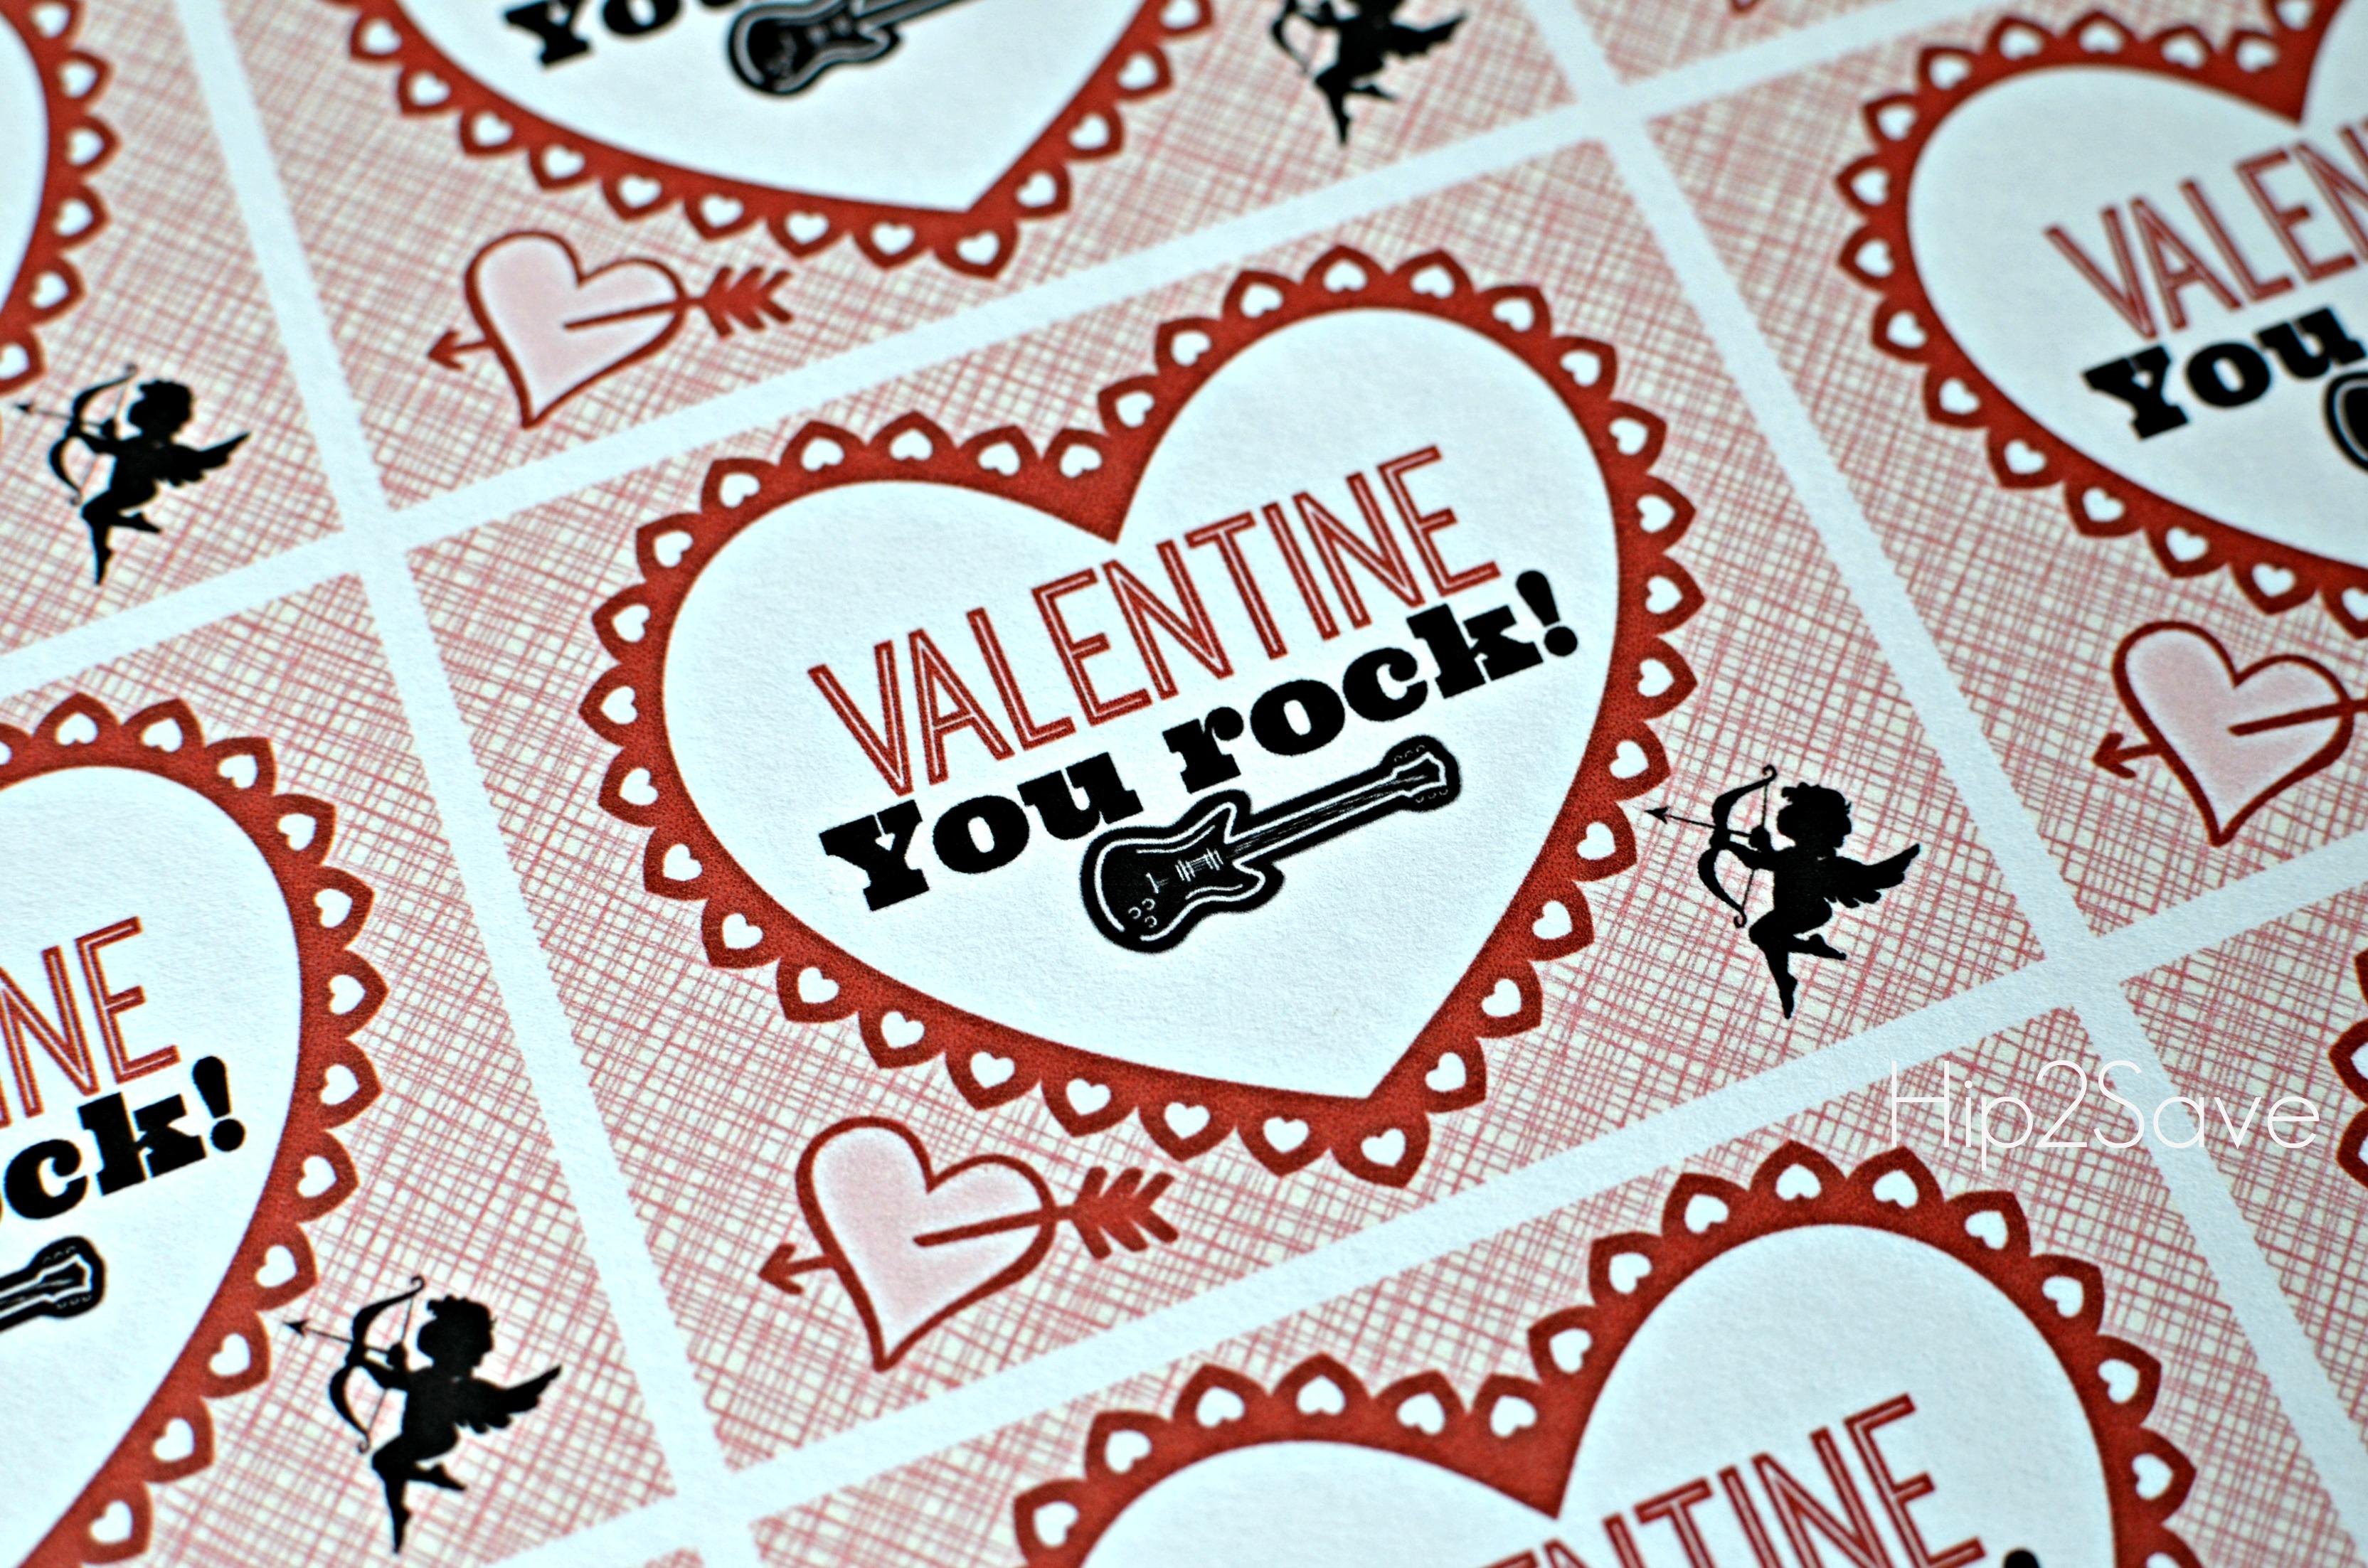 photograph regarding Pop Rocks Valentines Printable named Pop Rocks Valentines Working day Playing cards (+ Free of charge Printables) - Straightforward